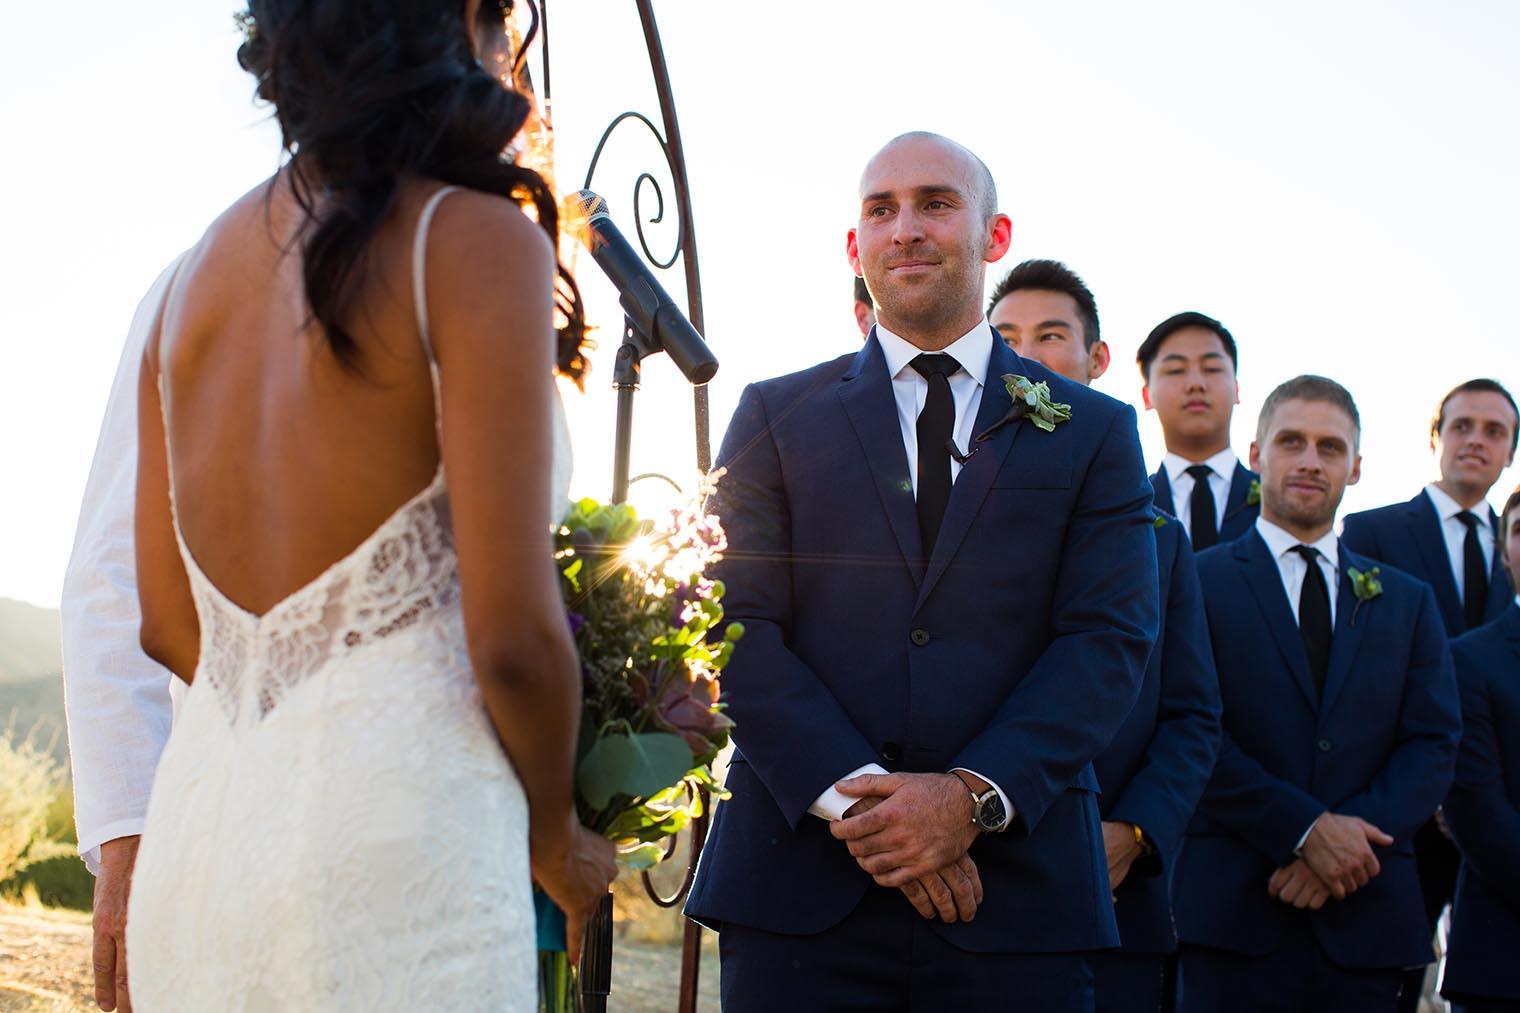 Sacred Sands Joshua Tree Wedding Ceremony 28 Dustin Cantrell